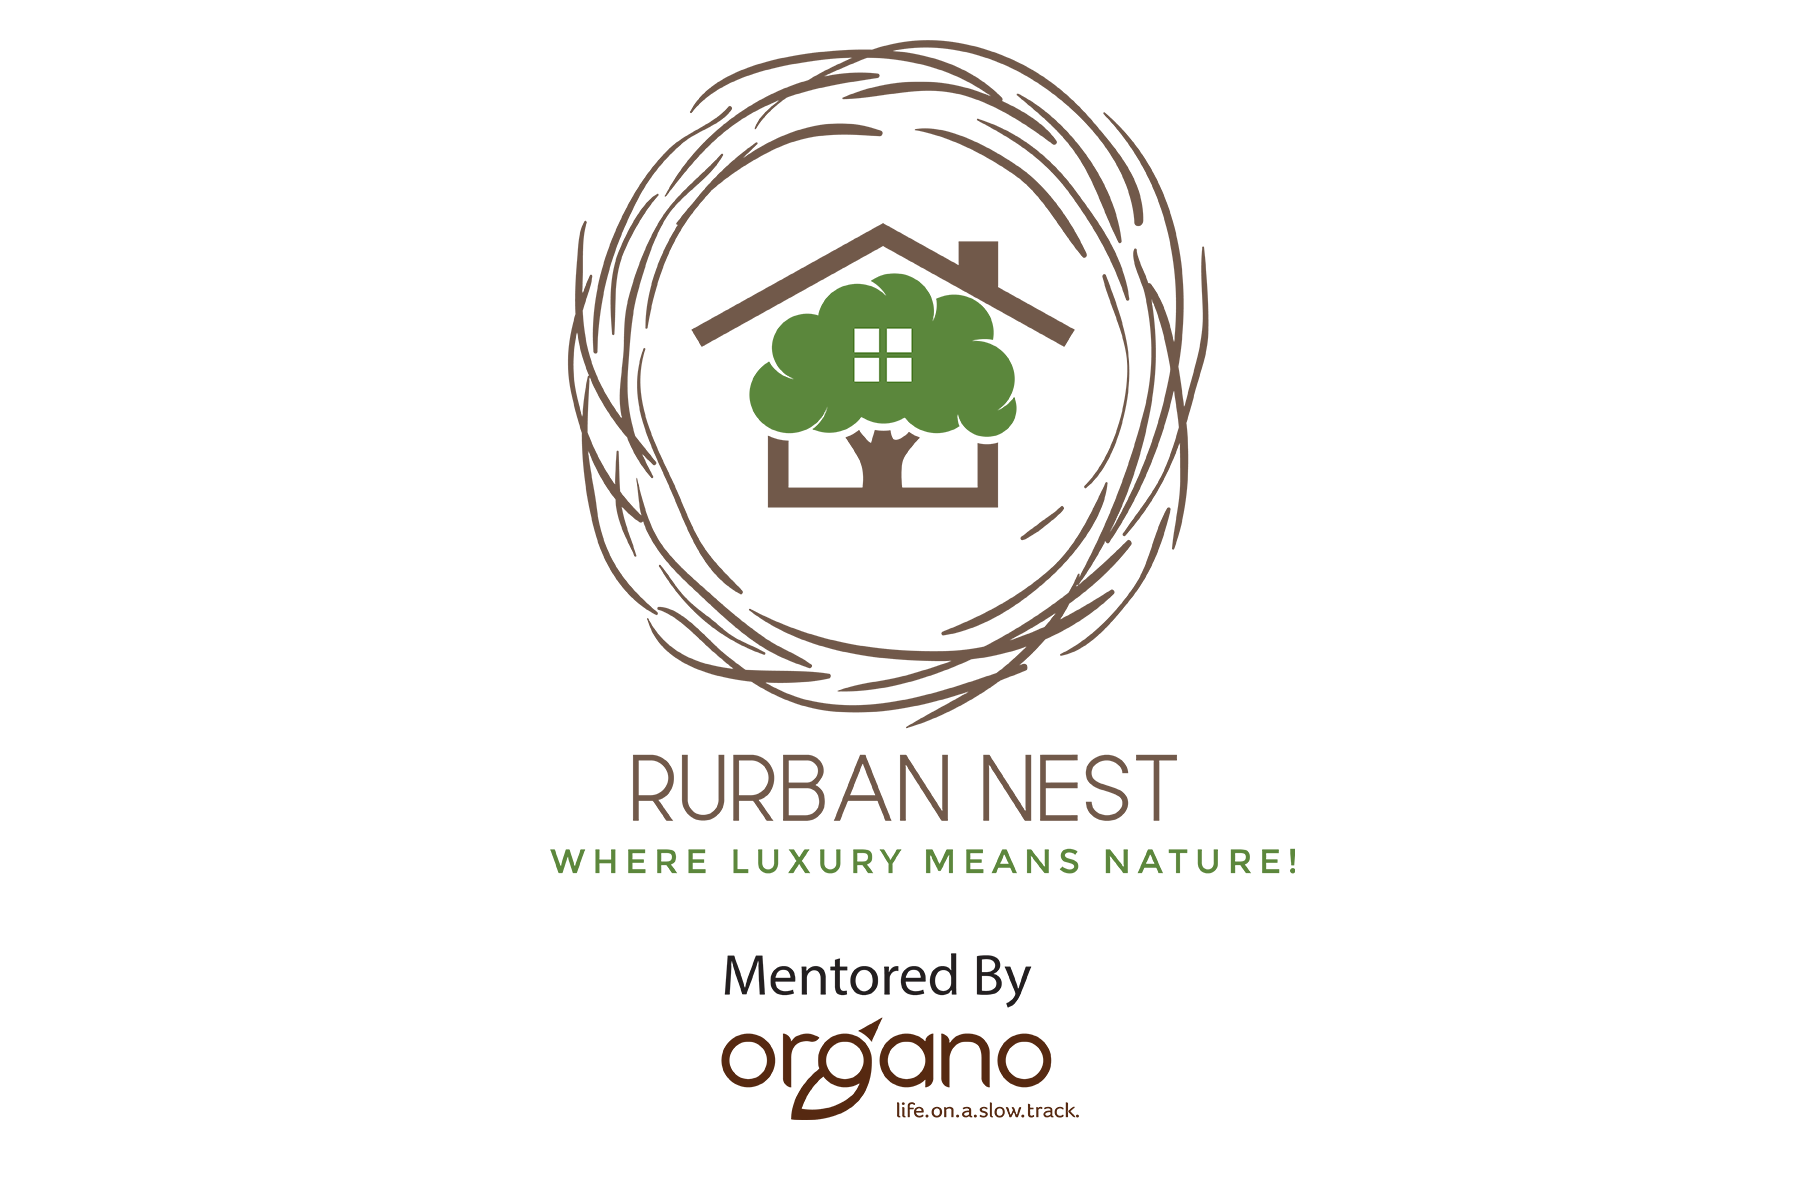 Organo Naandi arurban commune